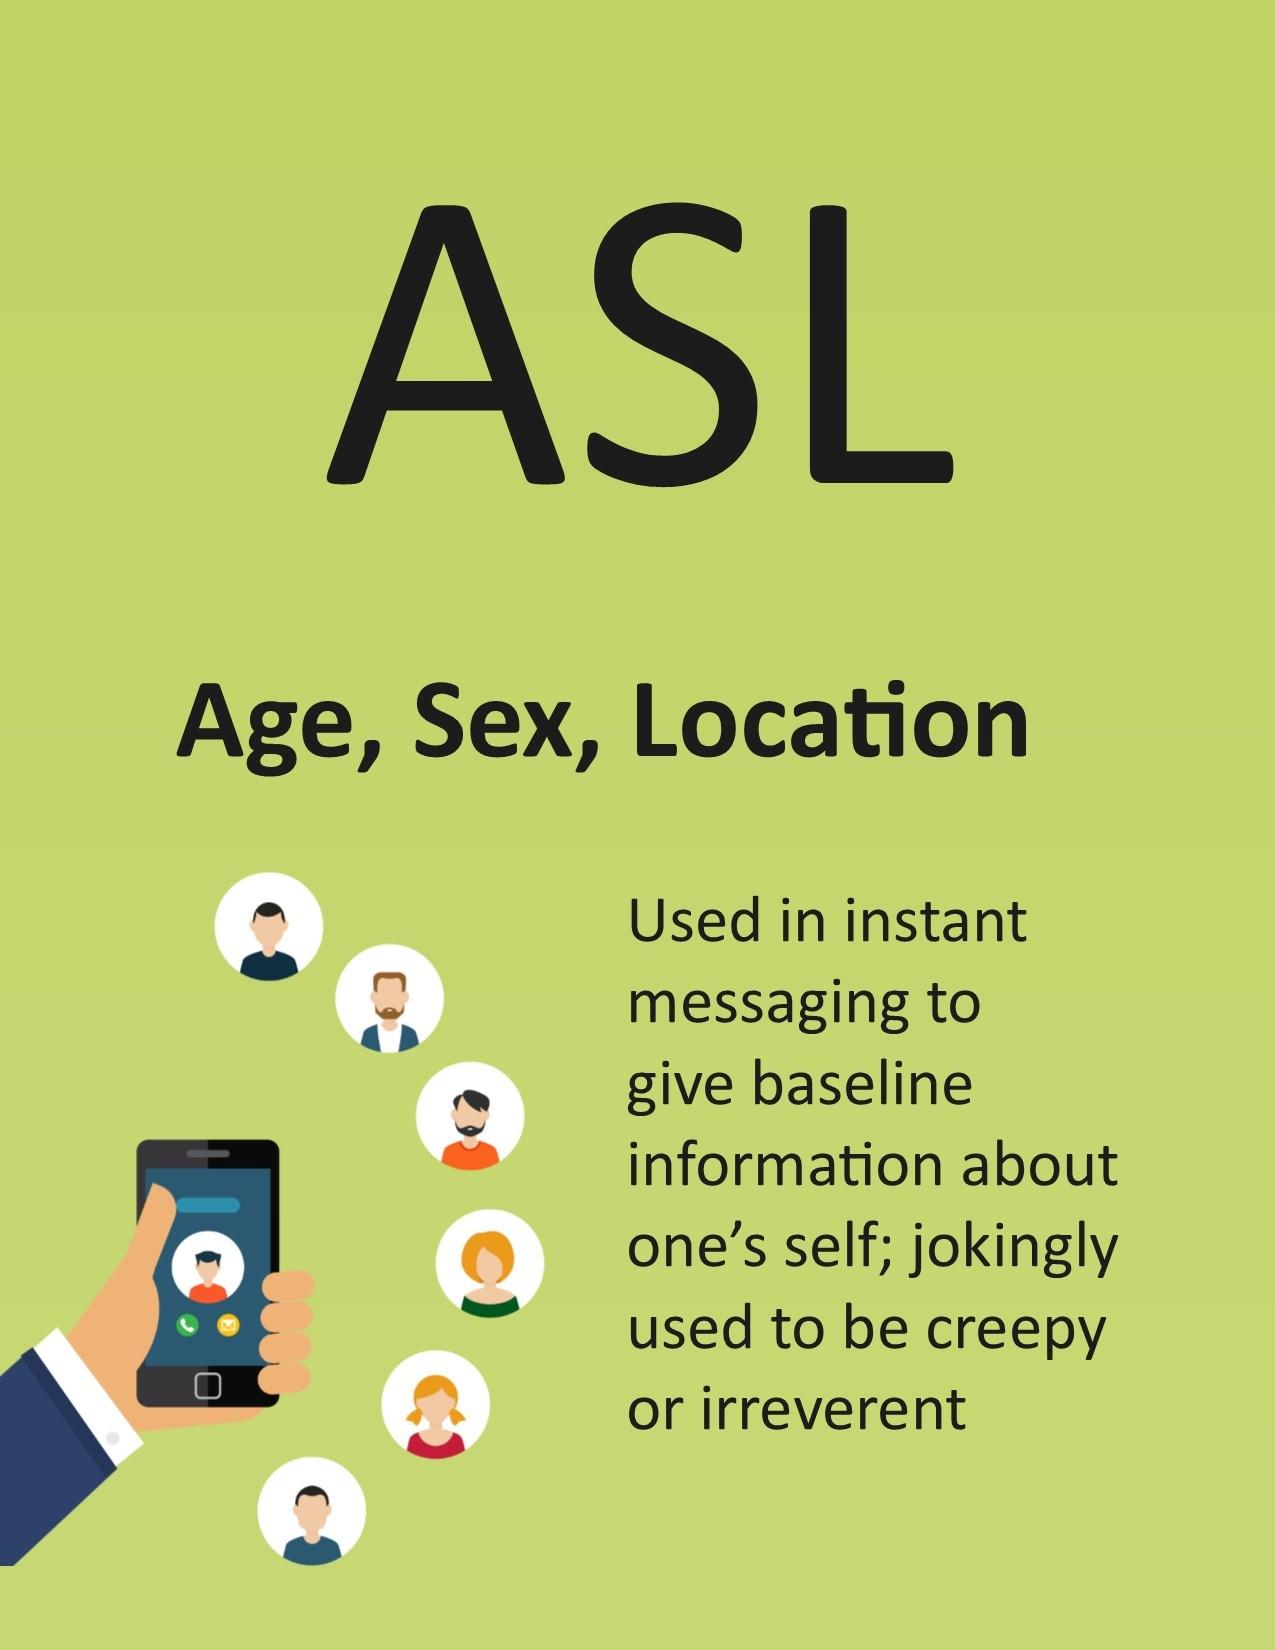 Age location picture sex